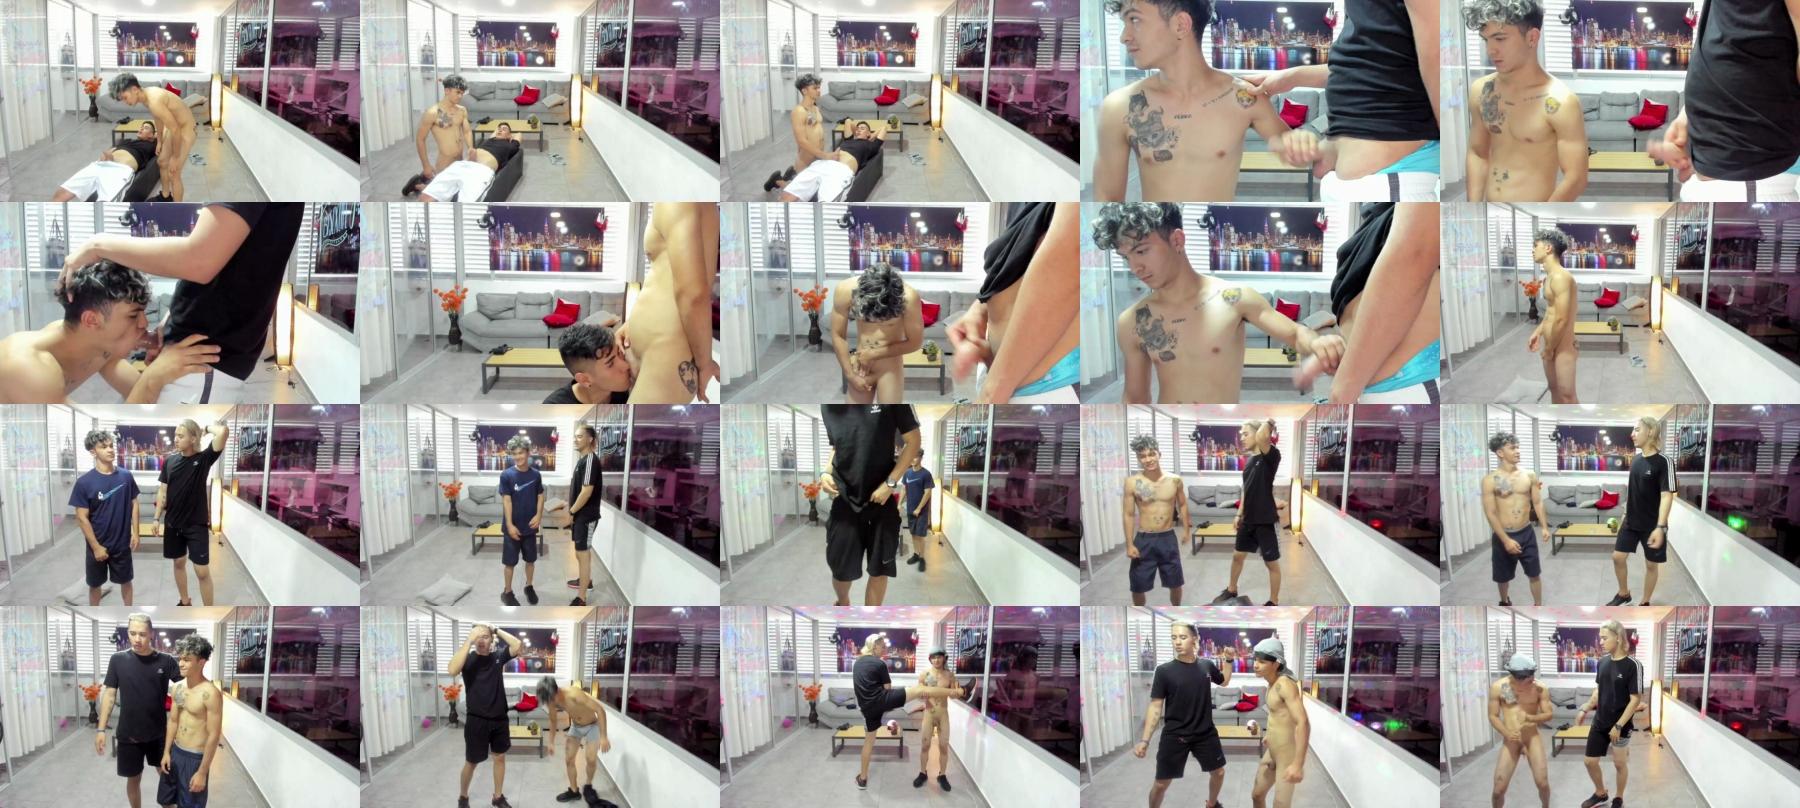 Bisexlife_Hot Chaturbate 22-07-2021 video kawaii